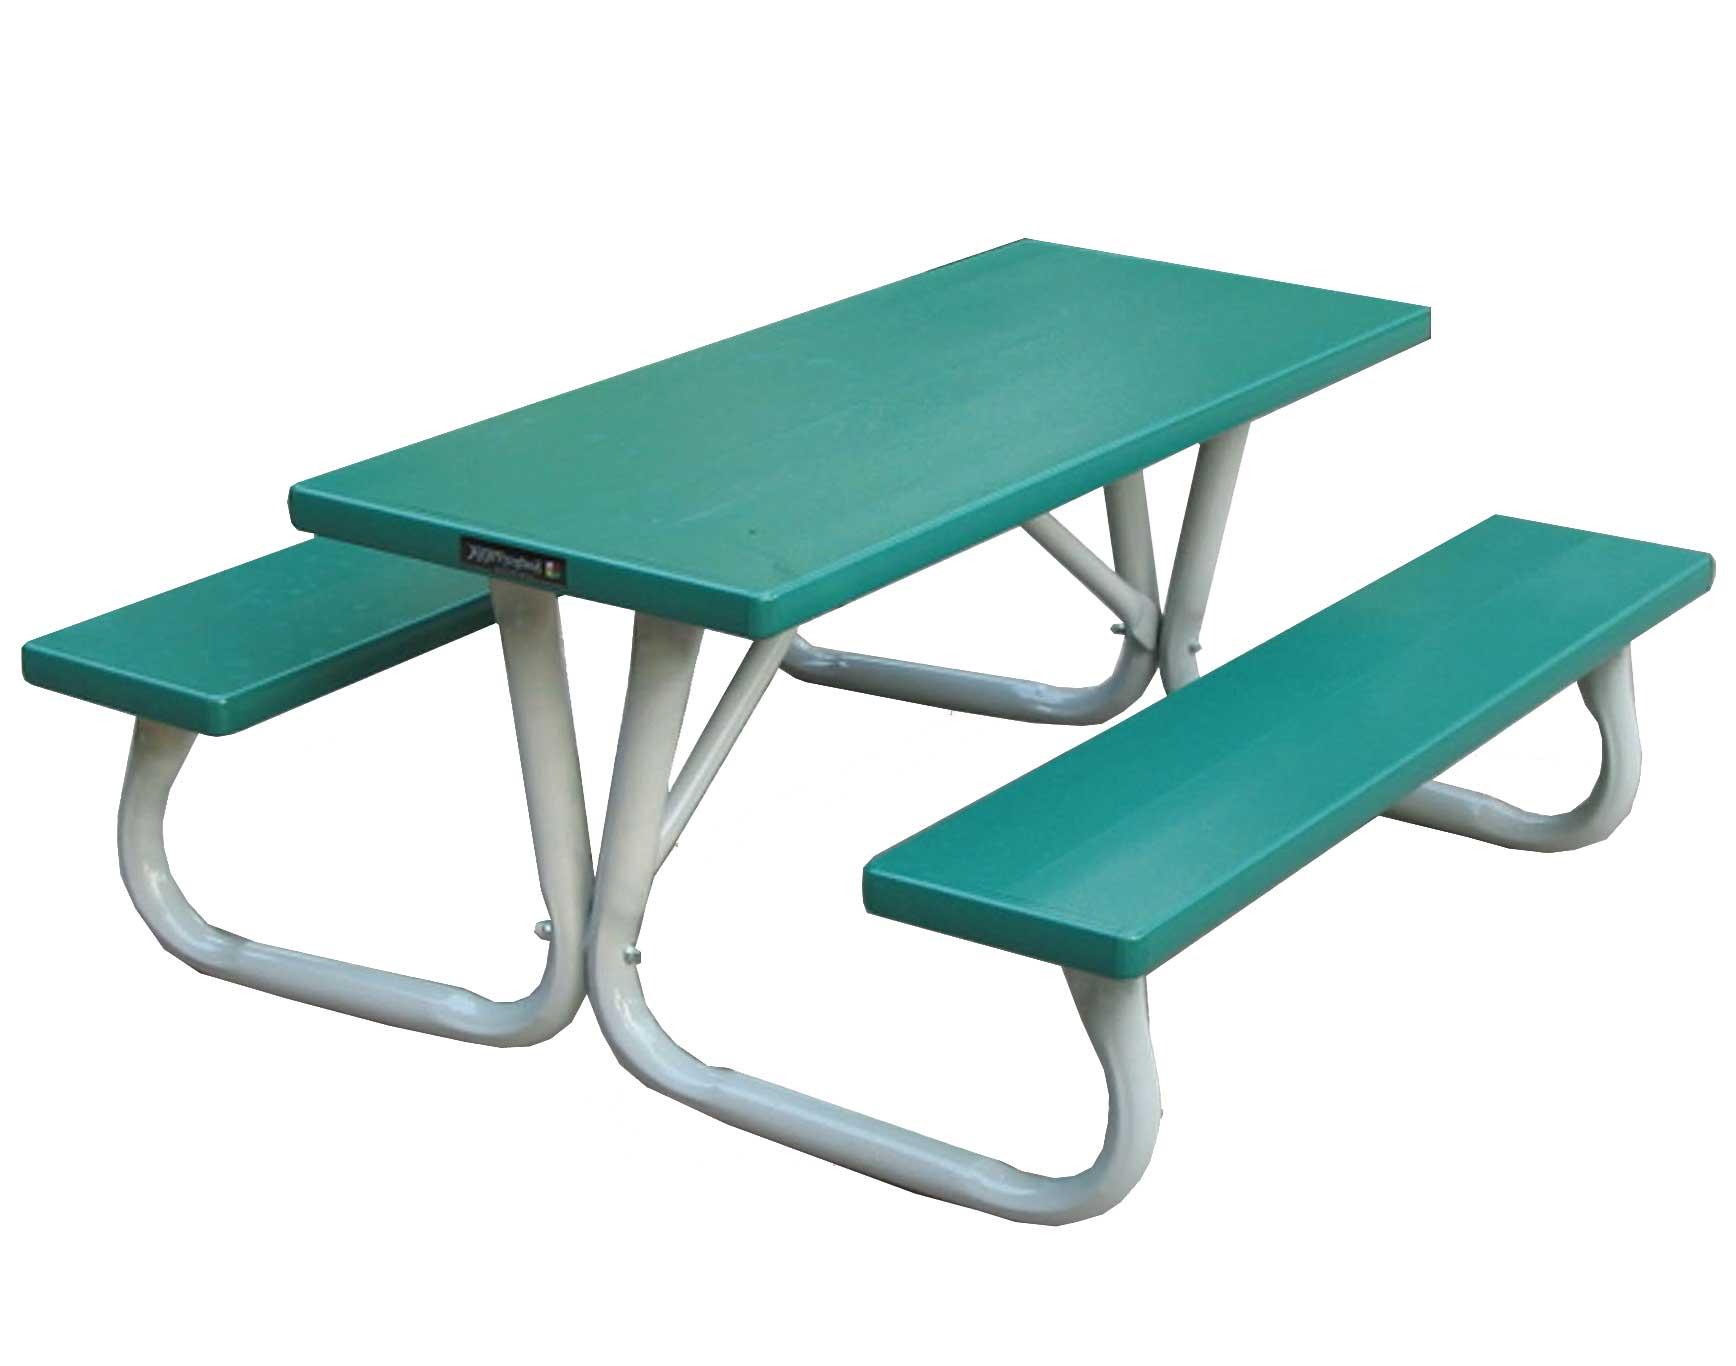 folding chair picnic table best office for the money 6 aluminum kid s kids